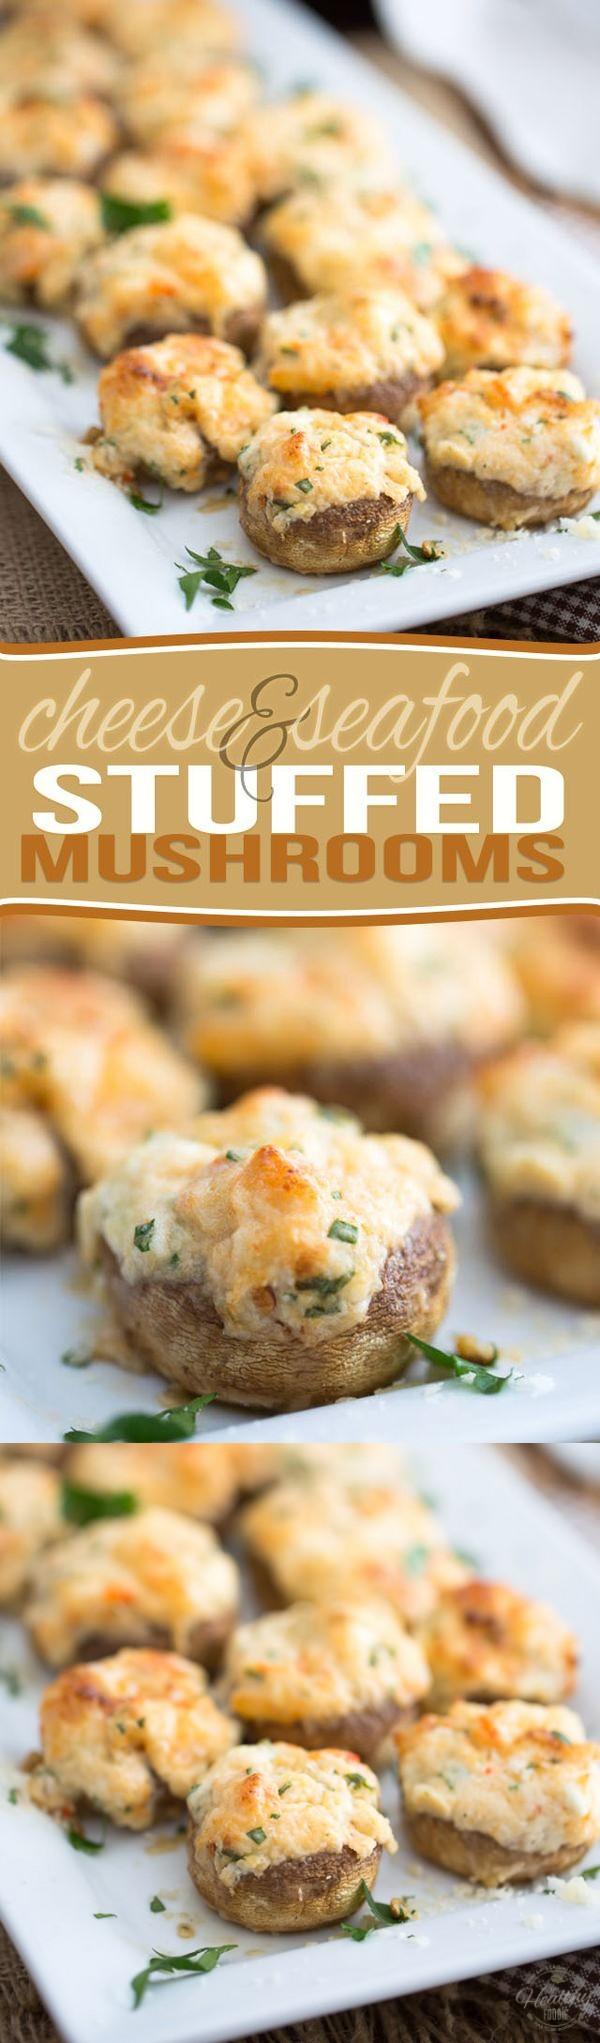 Cheese and Seafood Stuffed Mushrooms